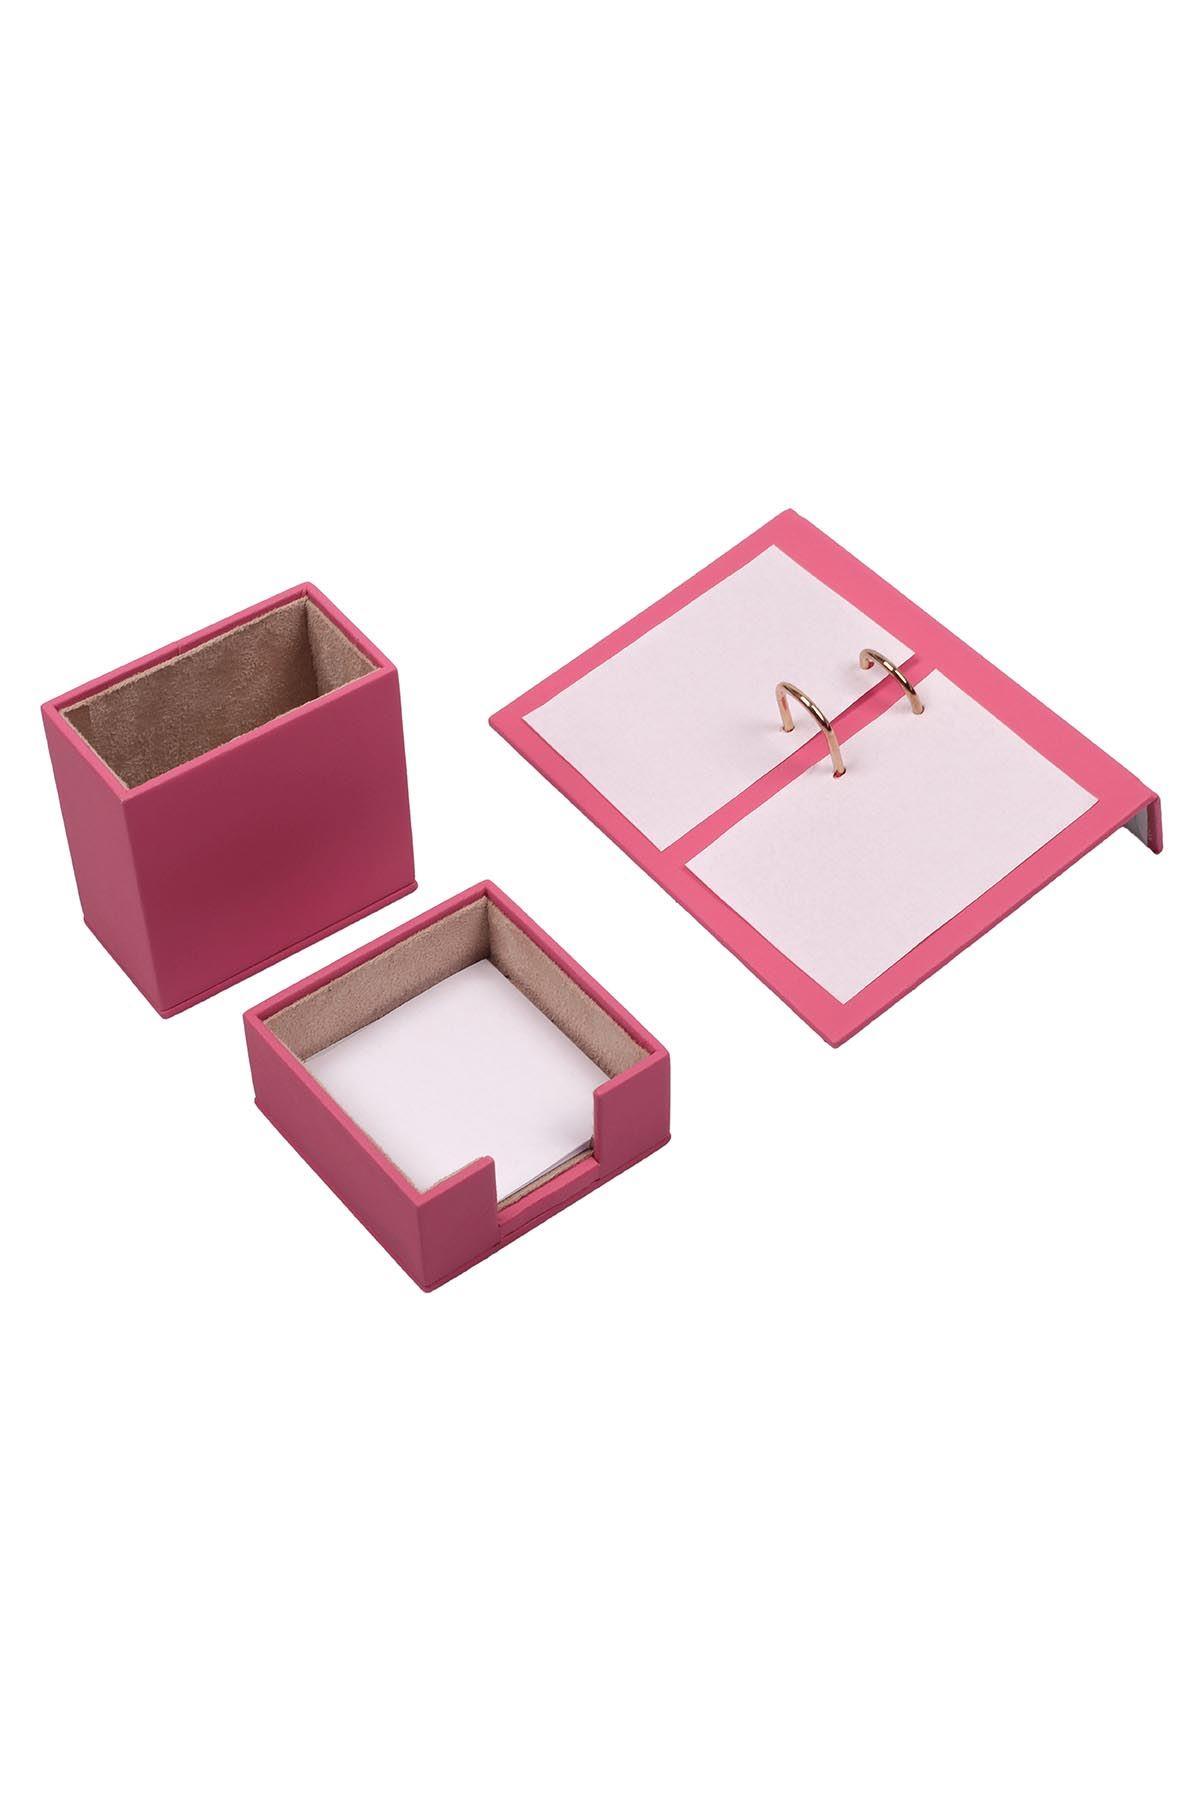 Leather Desk Accessories set of 3 | Desk Set Accessories Pink | Desktop Accessories | Desk Accessories | Desk Organizers